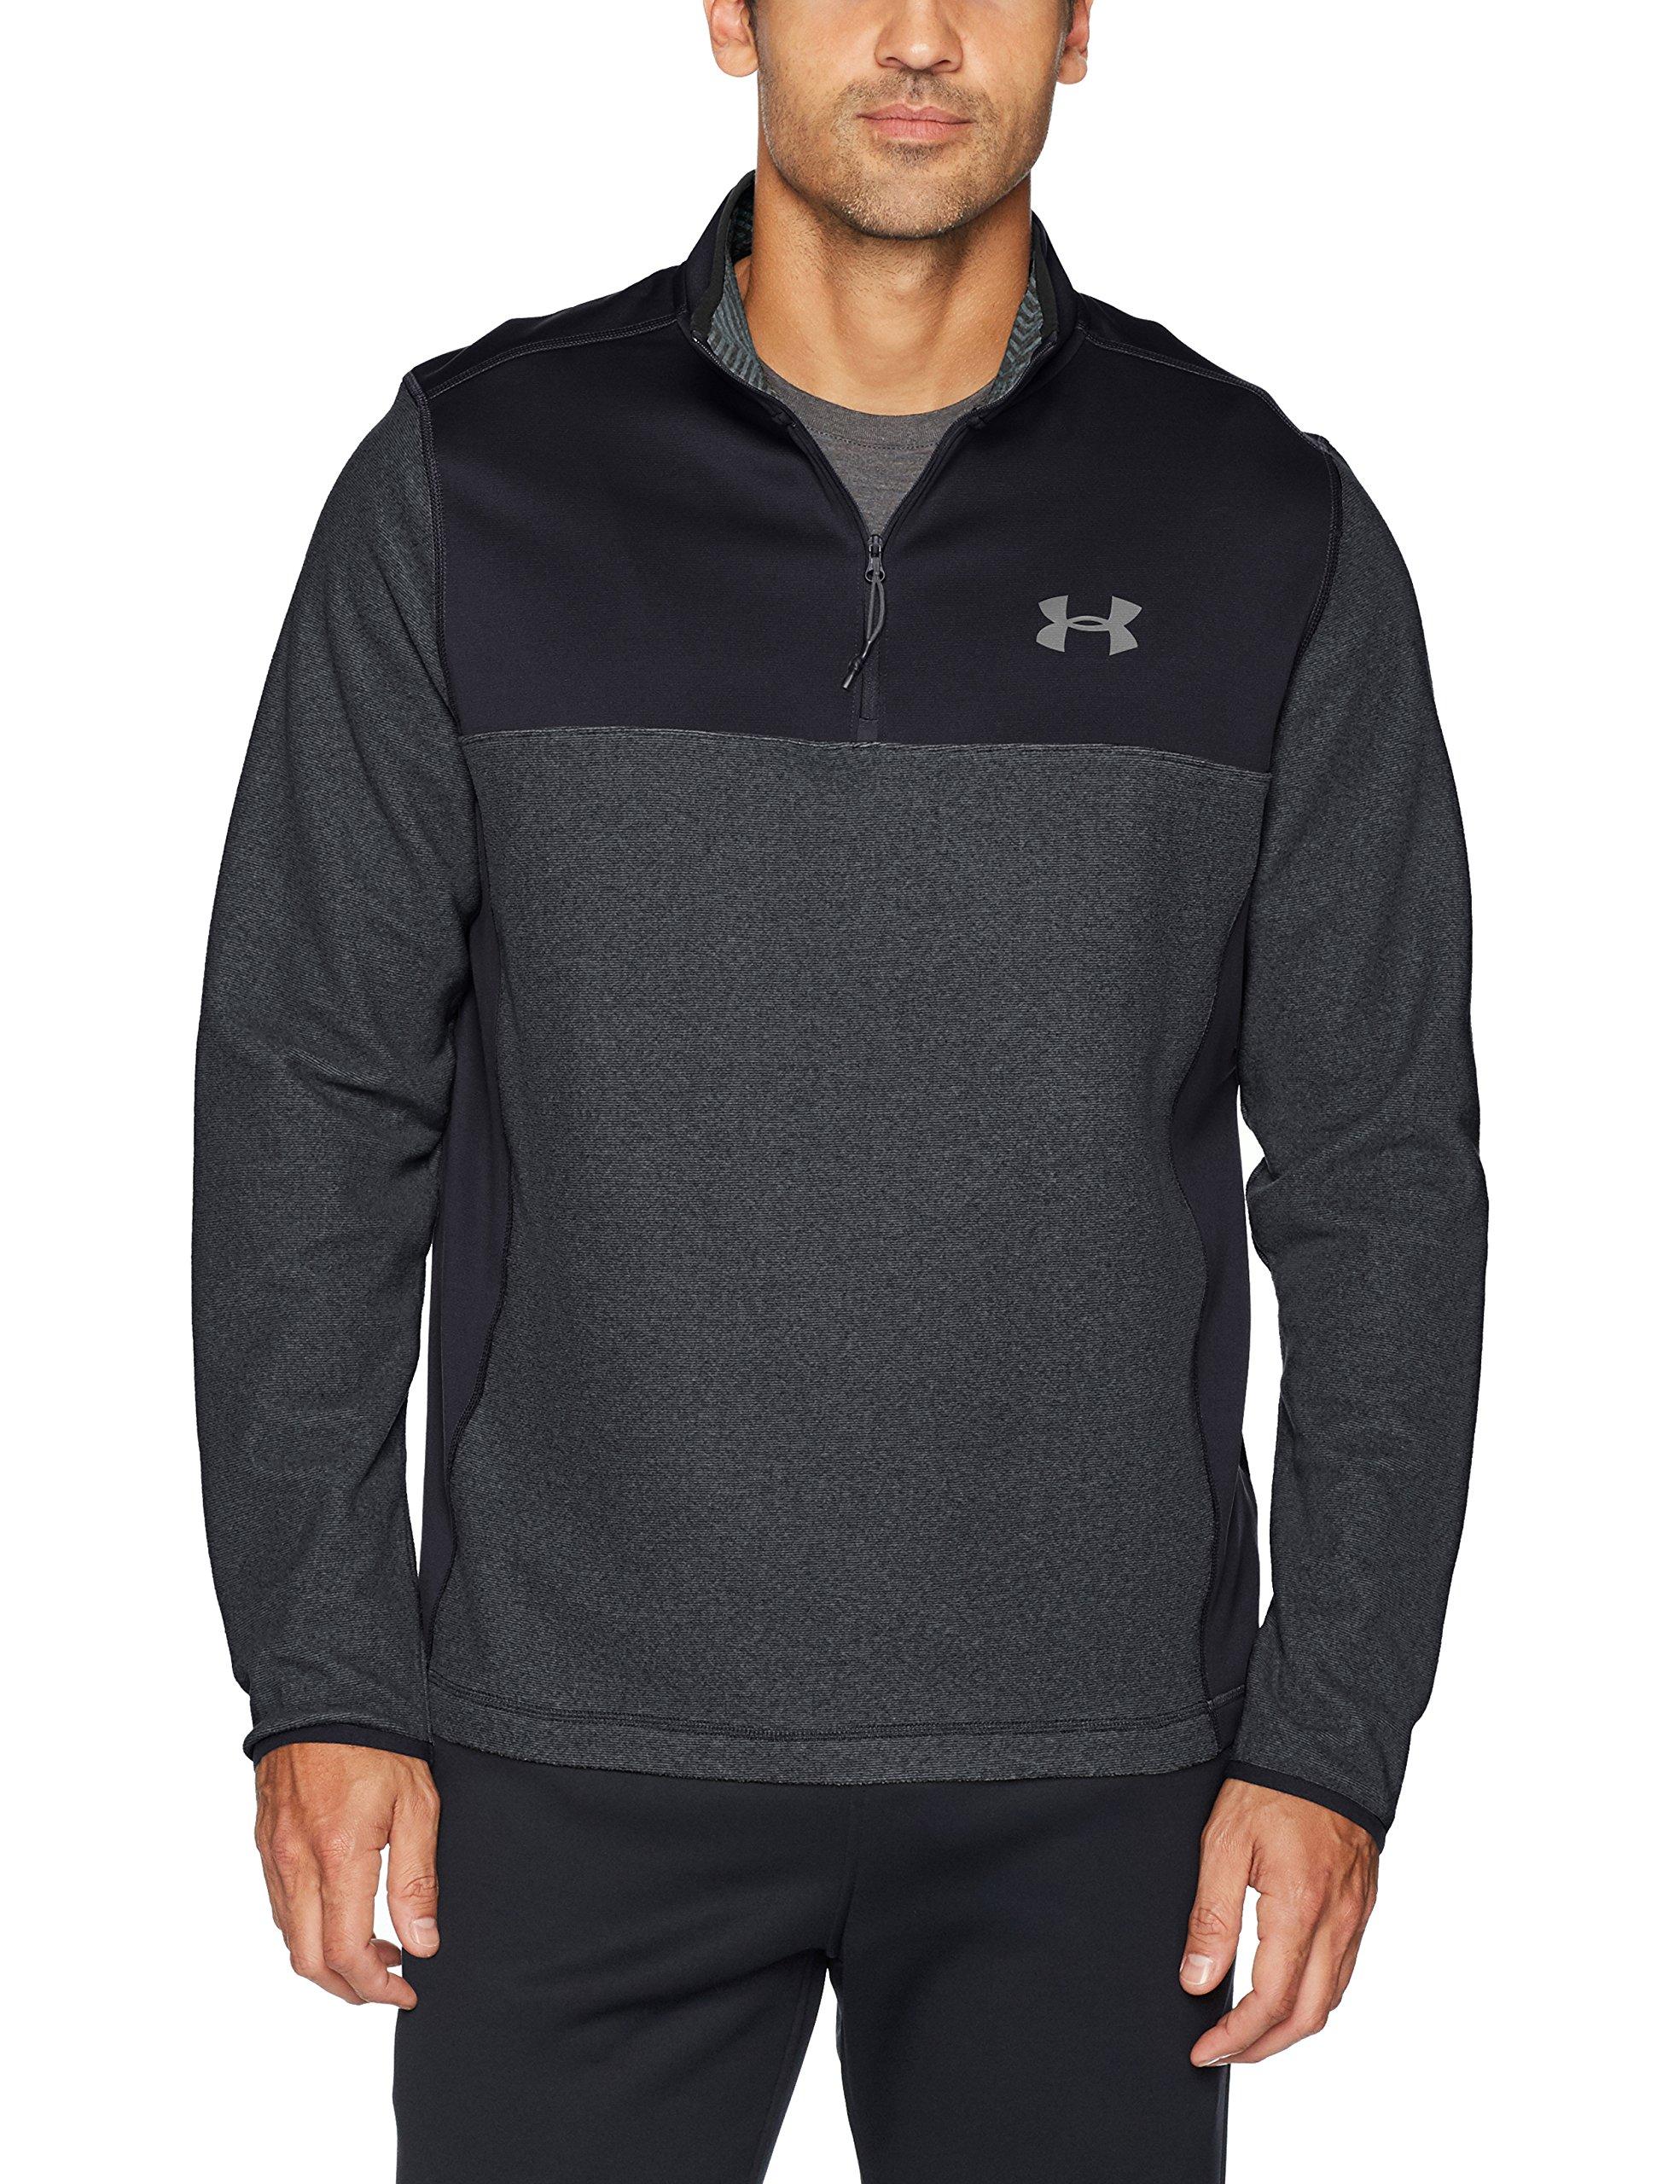 afad5602c3 Under Armour Men's Coldgear Infrared Fleece ¼ Zip Sweat Shirt,Black  (001)/Graphite, XX-Large